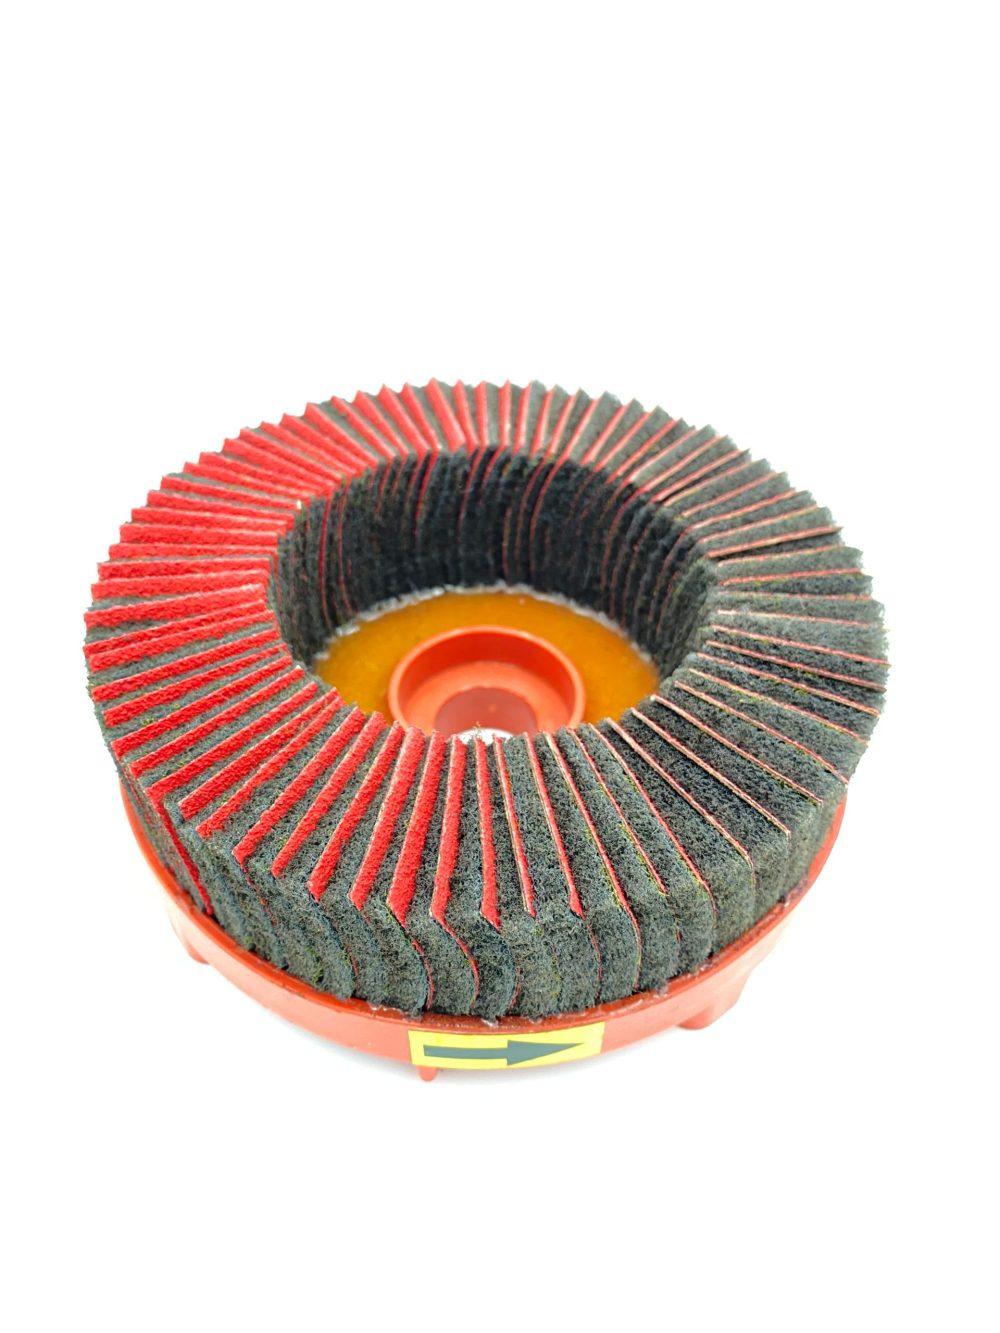 Disk Brush 80 Grit for RMT-SG1030-JS+D Finishing & Deburring Machine, Light Applications, Clockwise - RMTCS0096